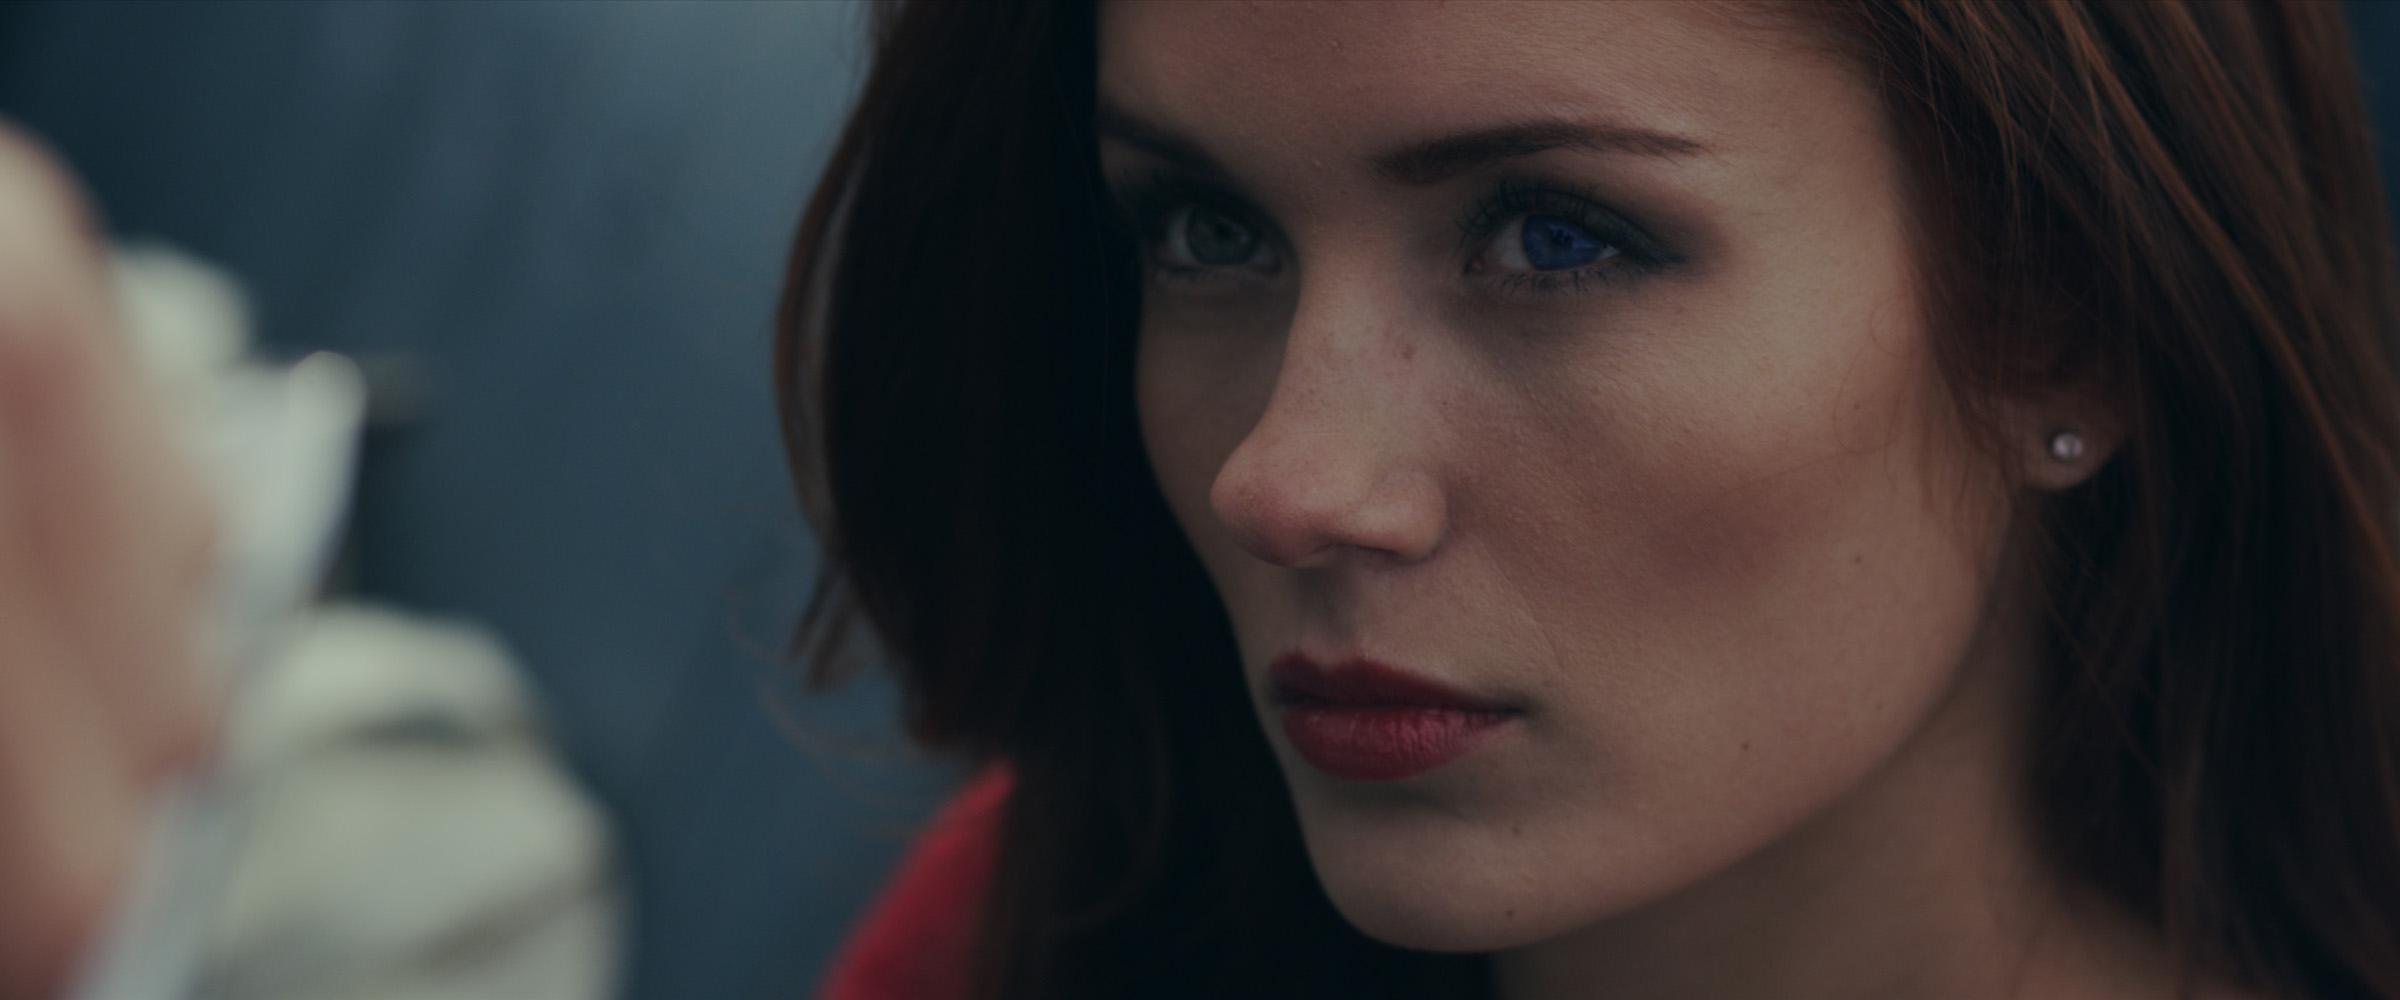 actress: Rashontae Wawrzyniak